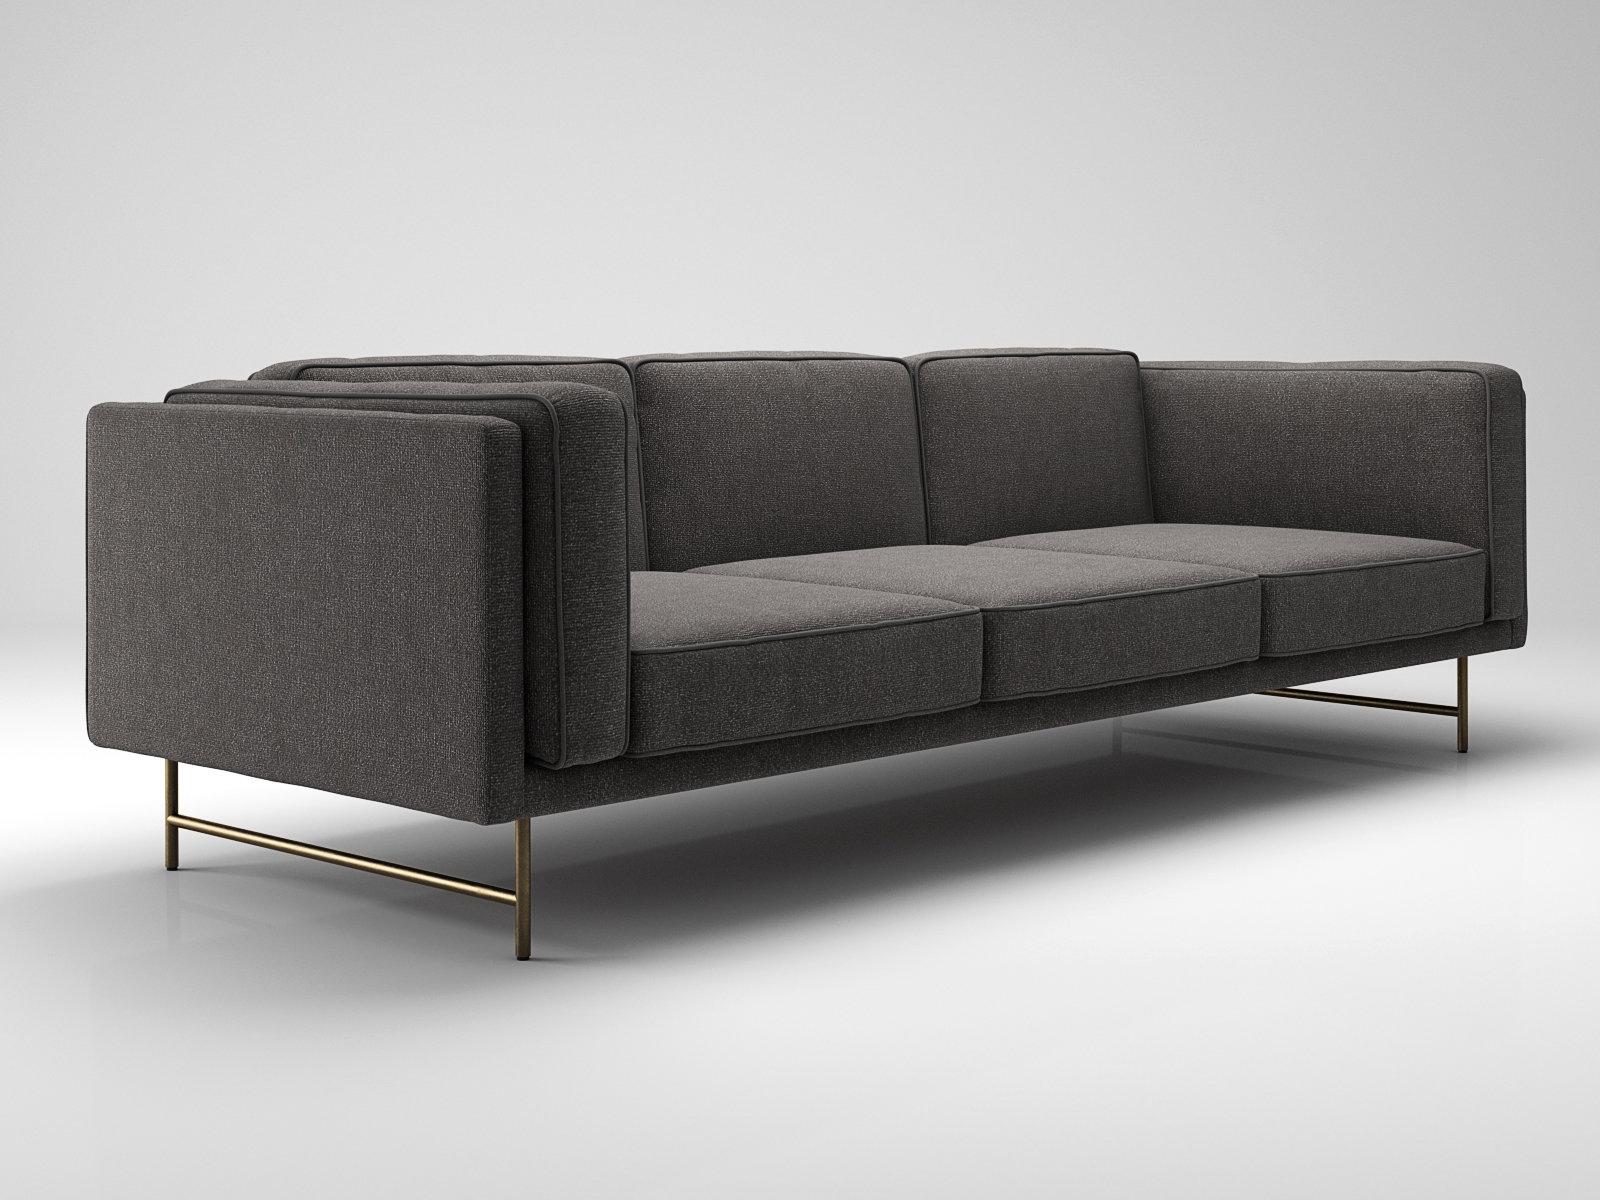 bank sofa 3 seater modello 3d blu dot. Black Bedroom Furniture Sets. Home Design Ideas